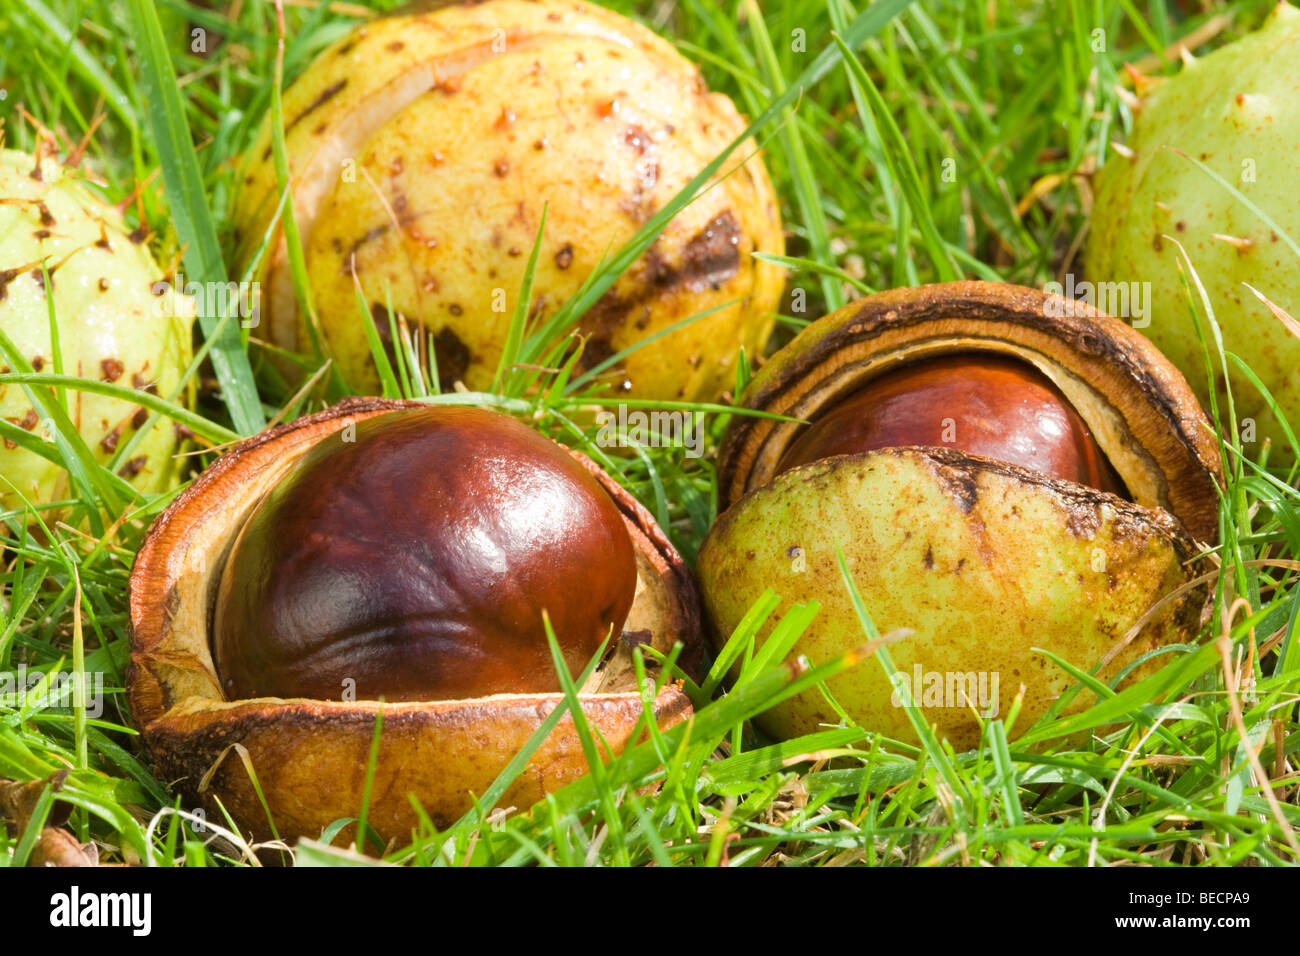 Fallen conkers. Horse-chestnut, Aesculus hippocastanum. UK - Stock Image